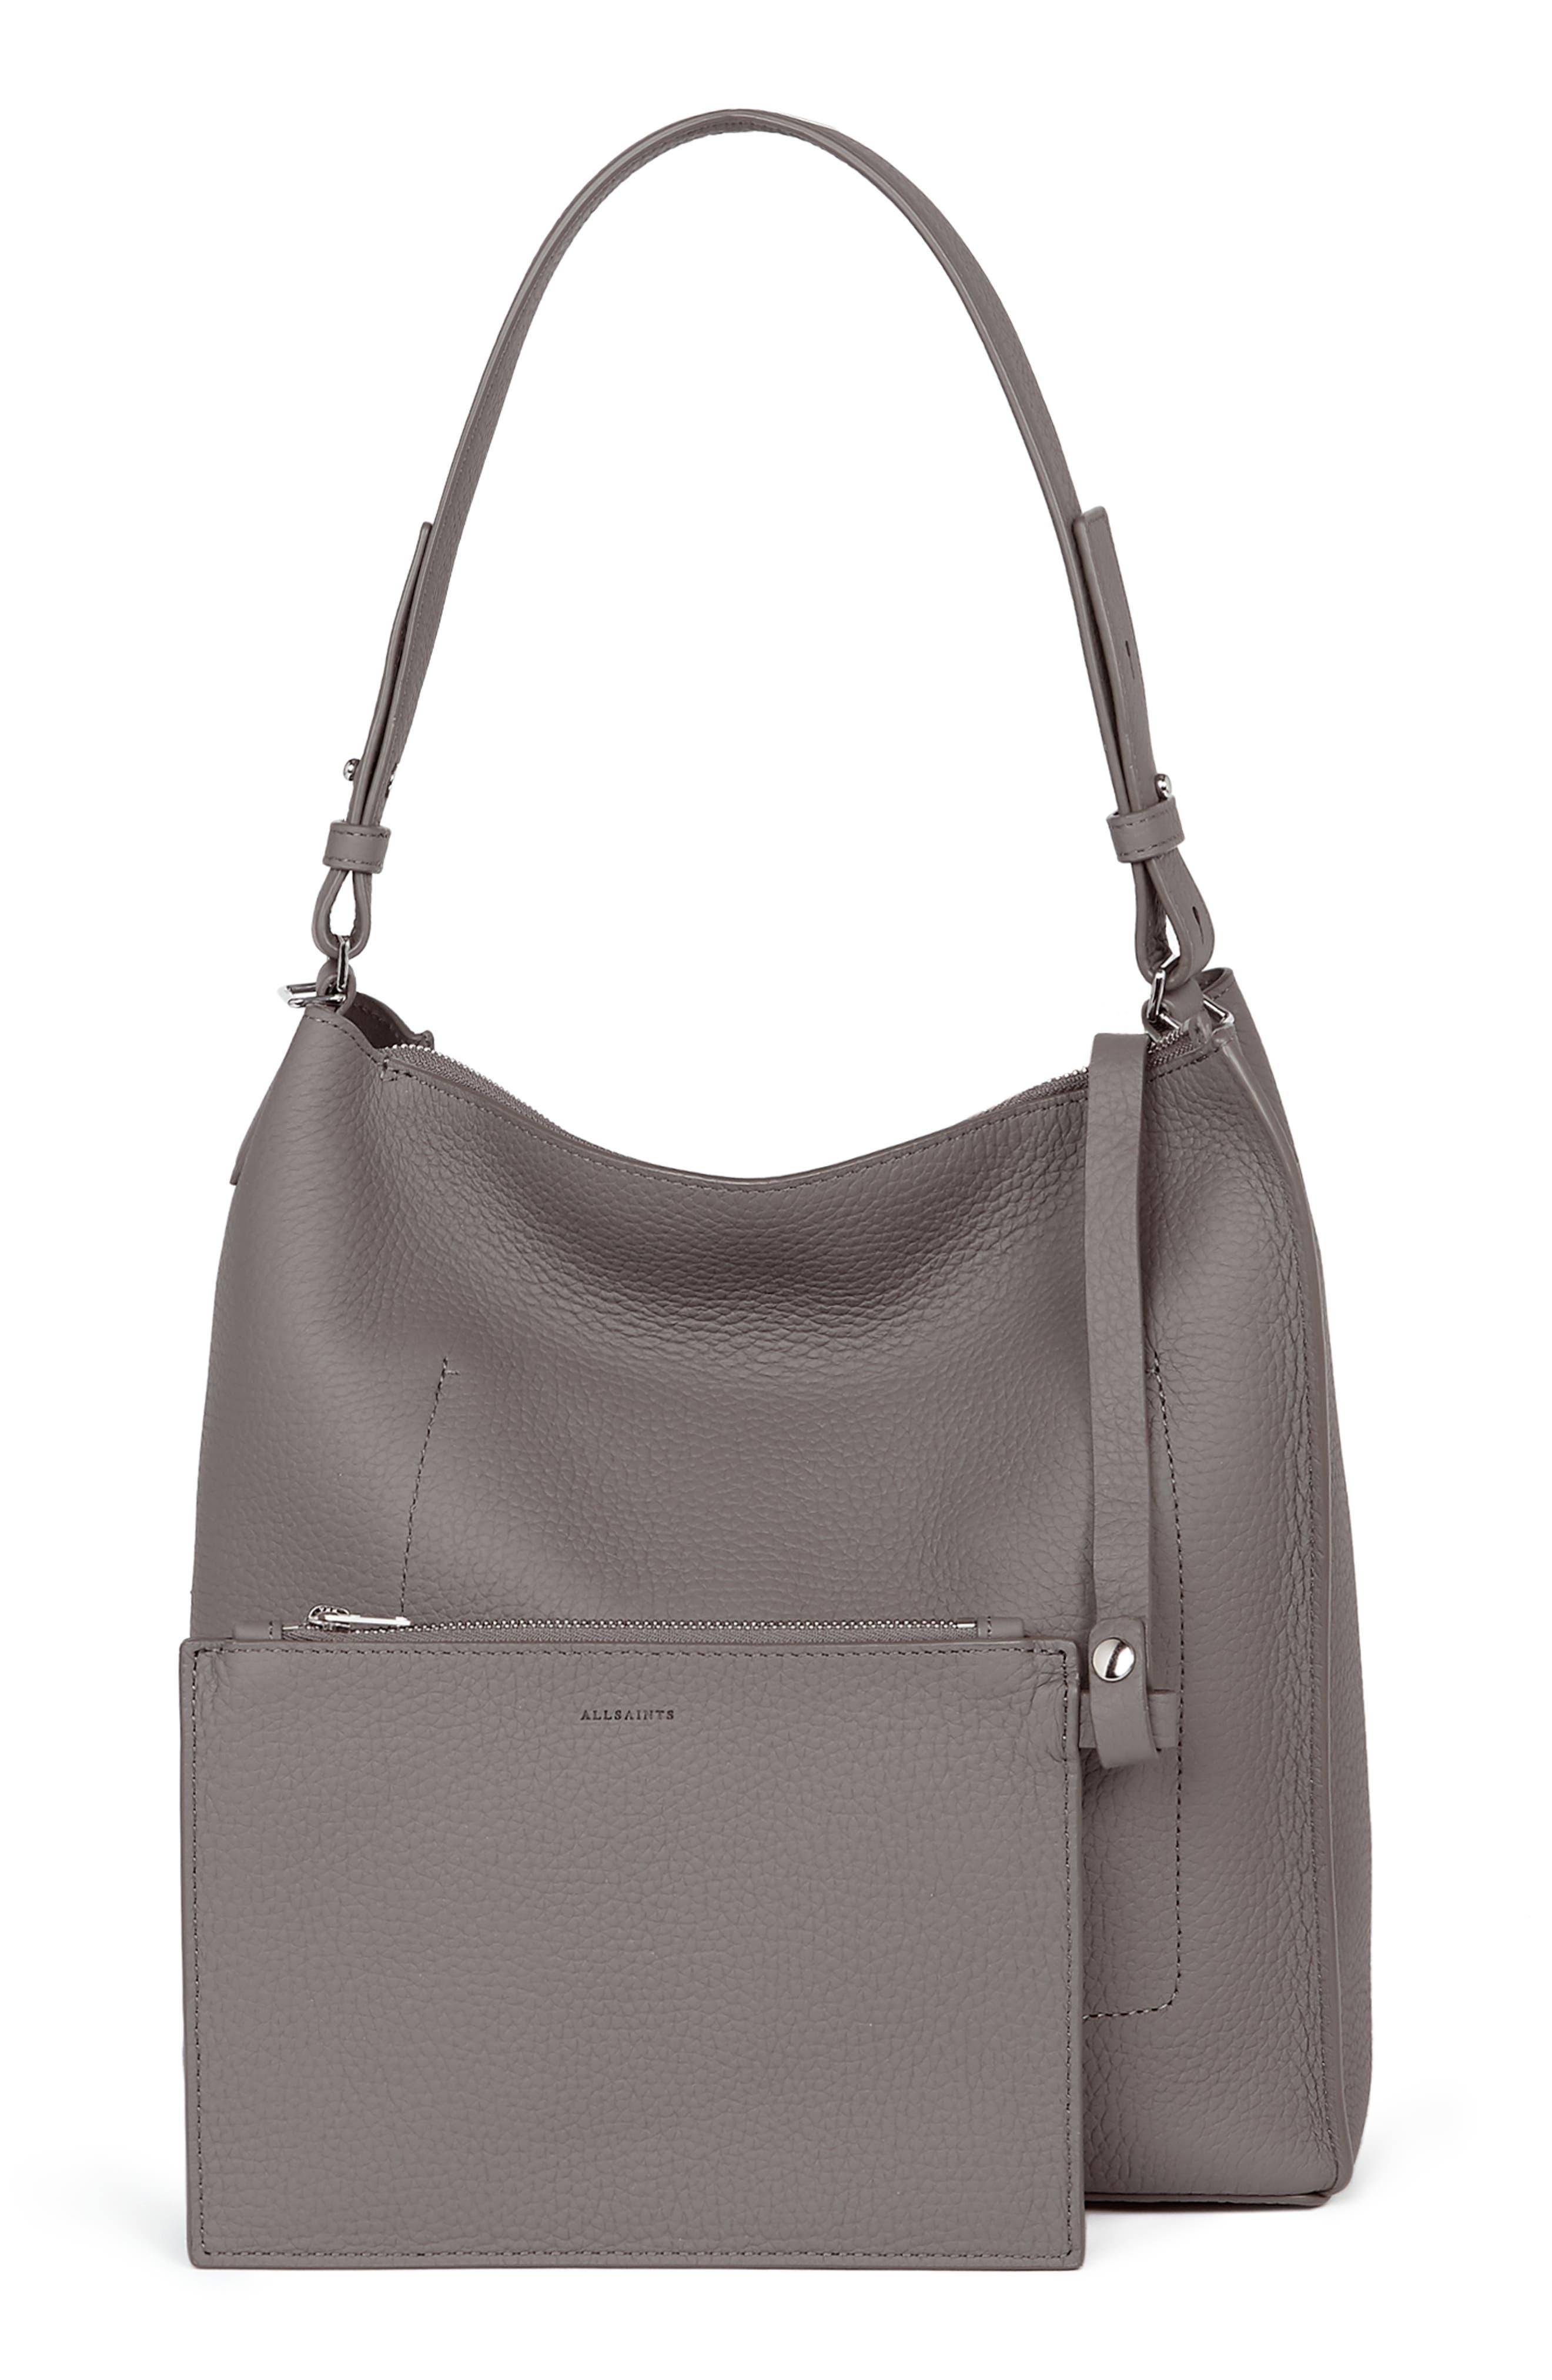 'Kita' Leather Shoulder/Crossbody Bag,                             Alternate thumbnail 2, color,                             STORM GREY